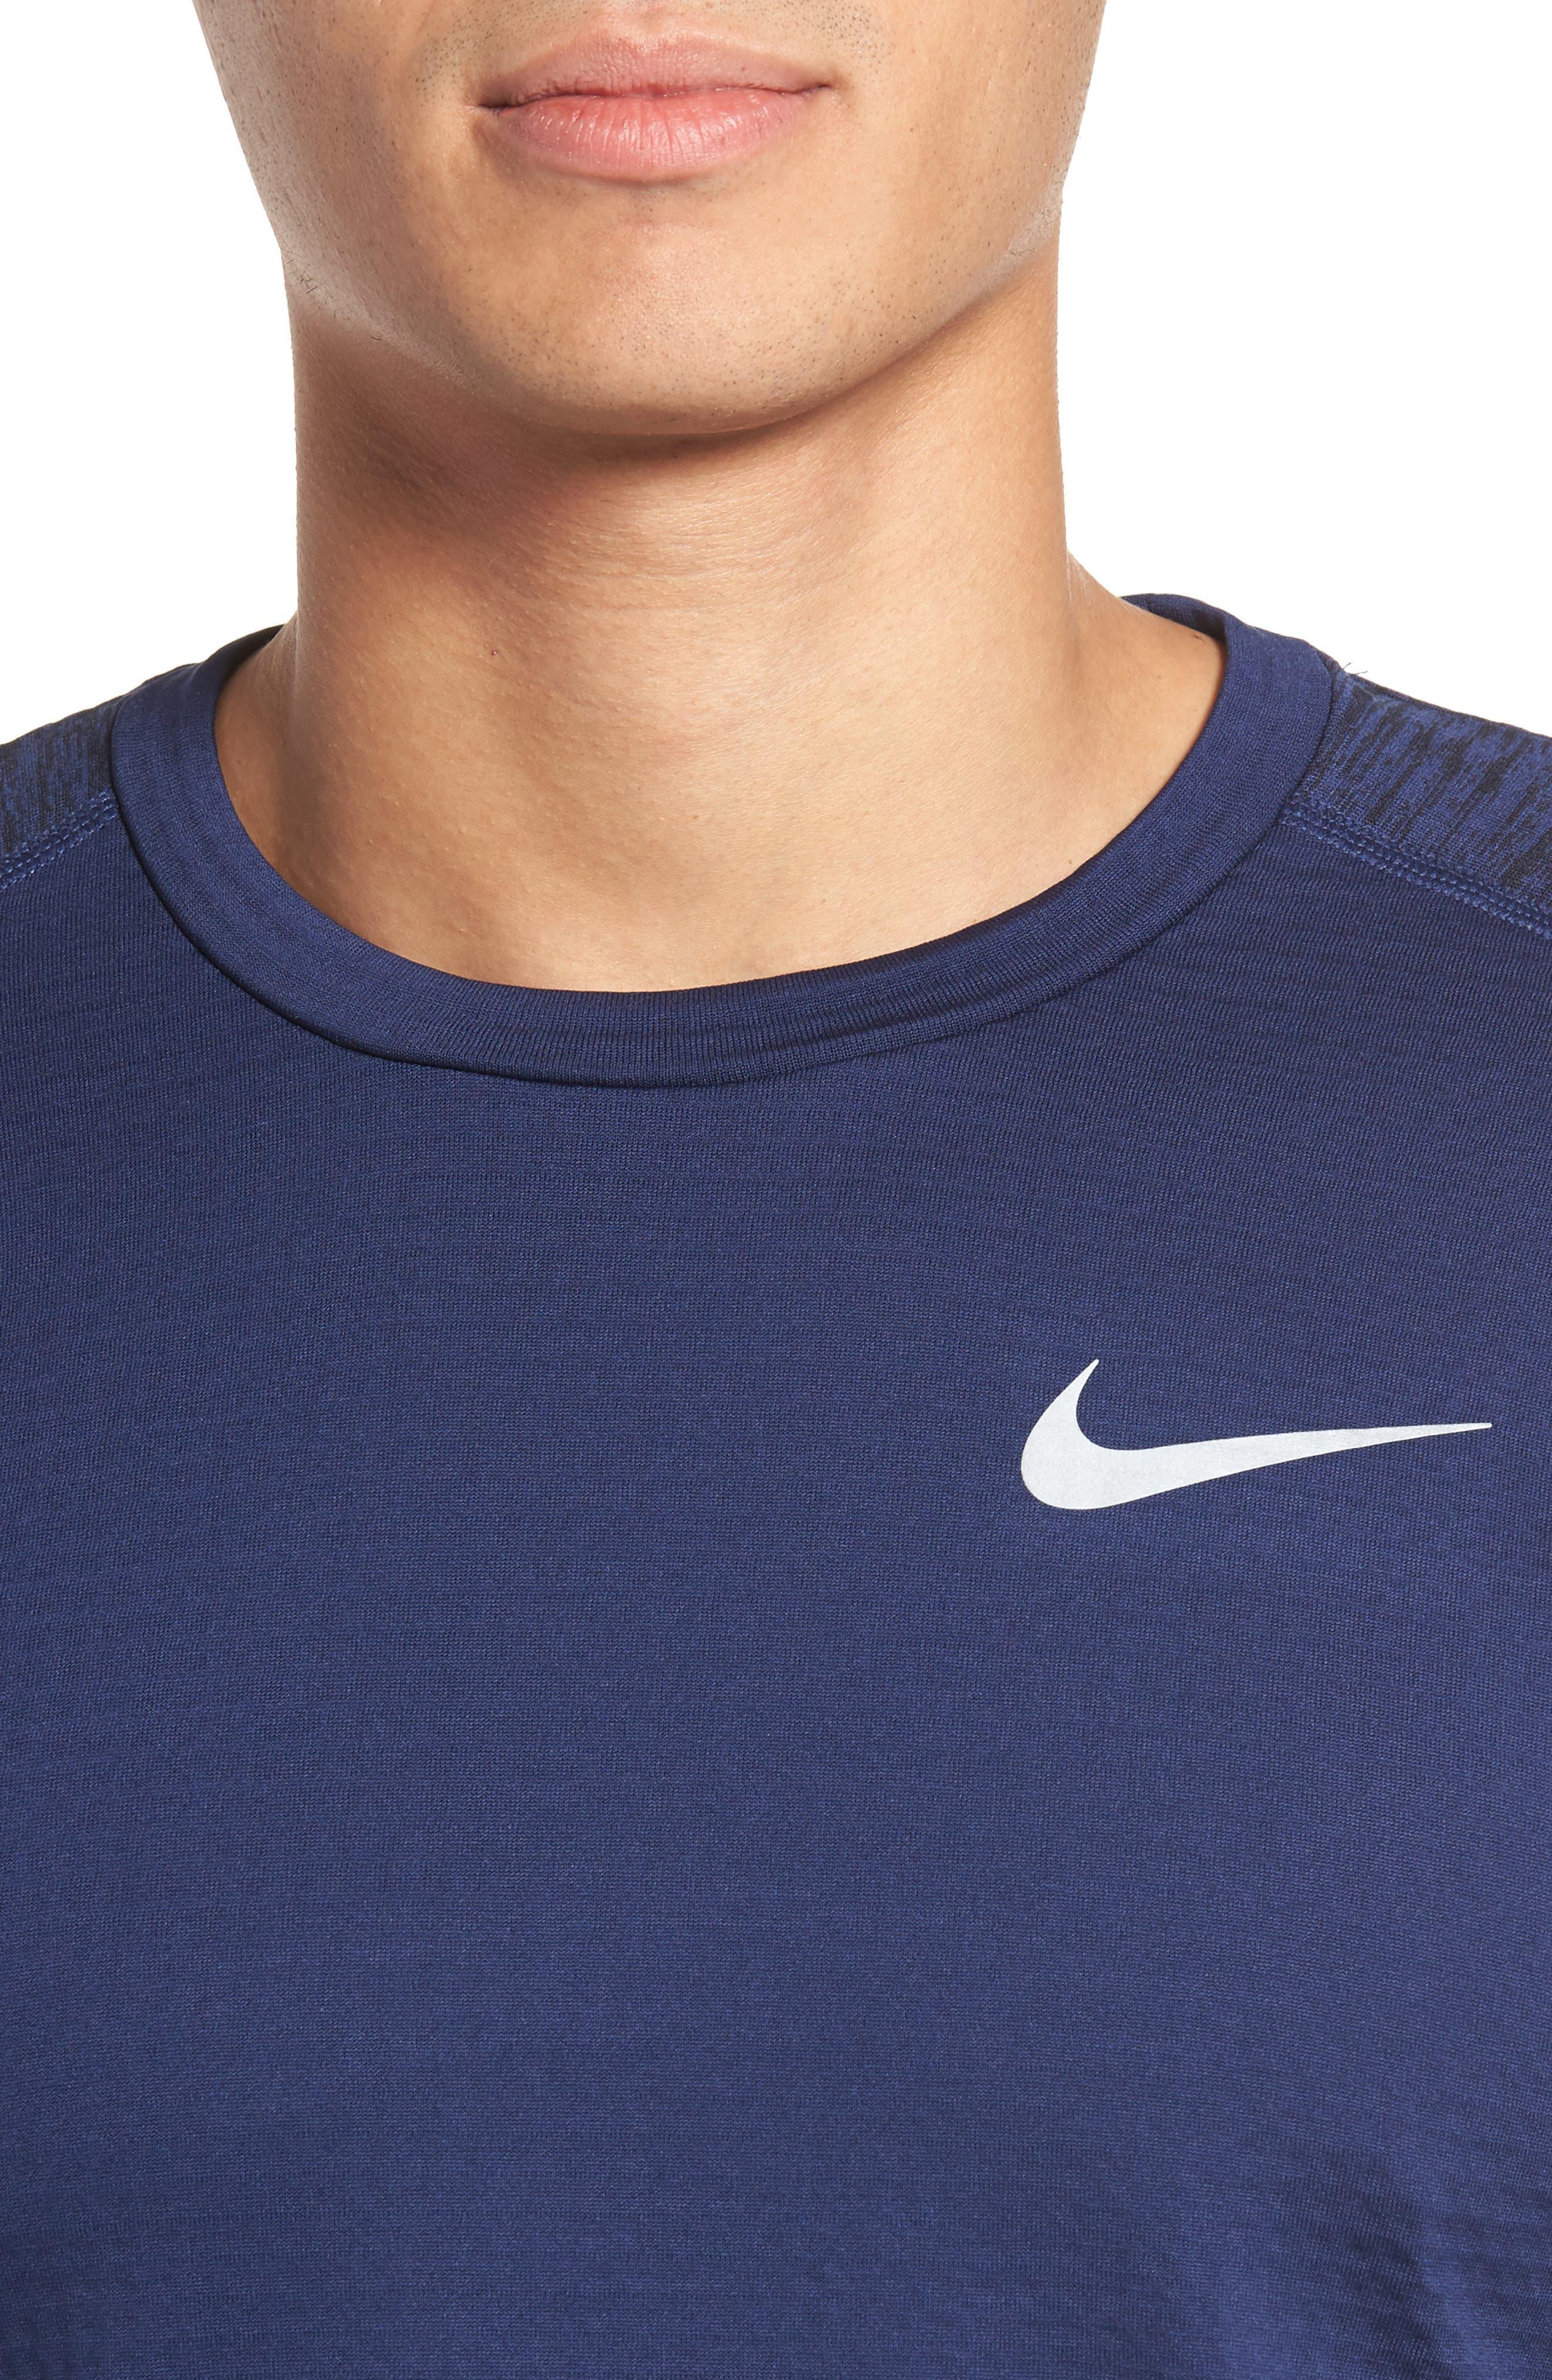 ThermaSphere Long Sleeve Running T-Shirt,                             Alternate thumbnail 8, color,                             Binary Blue/ Purple/ Heather